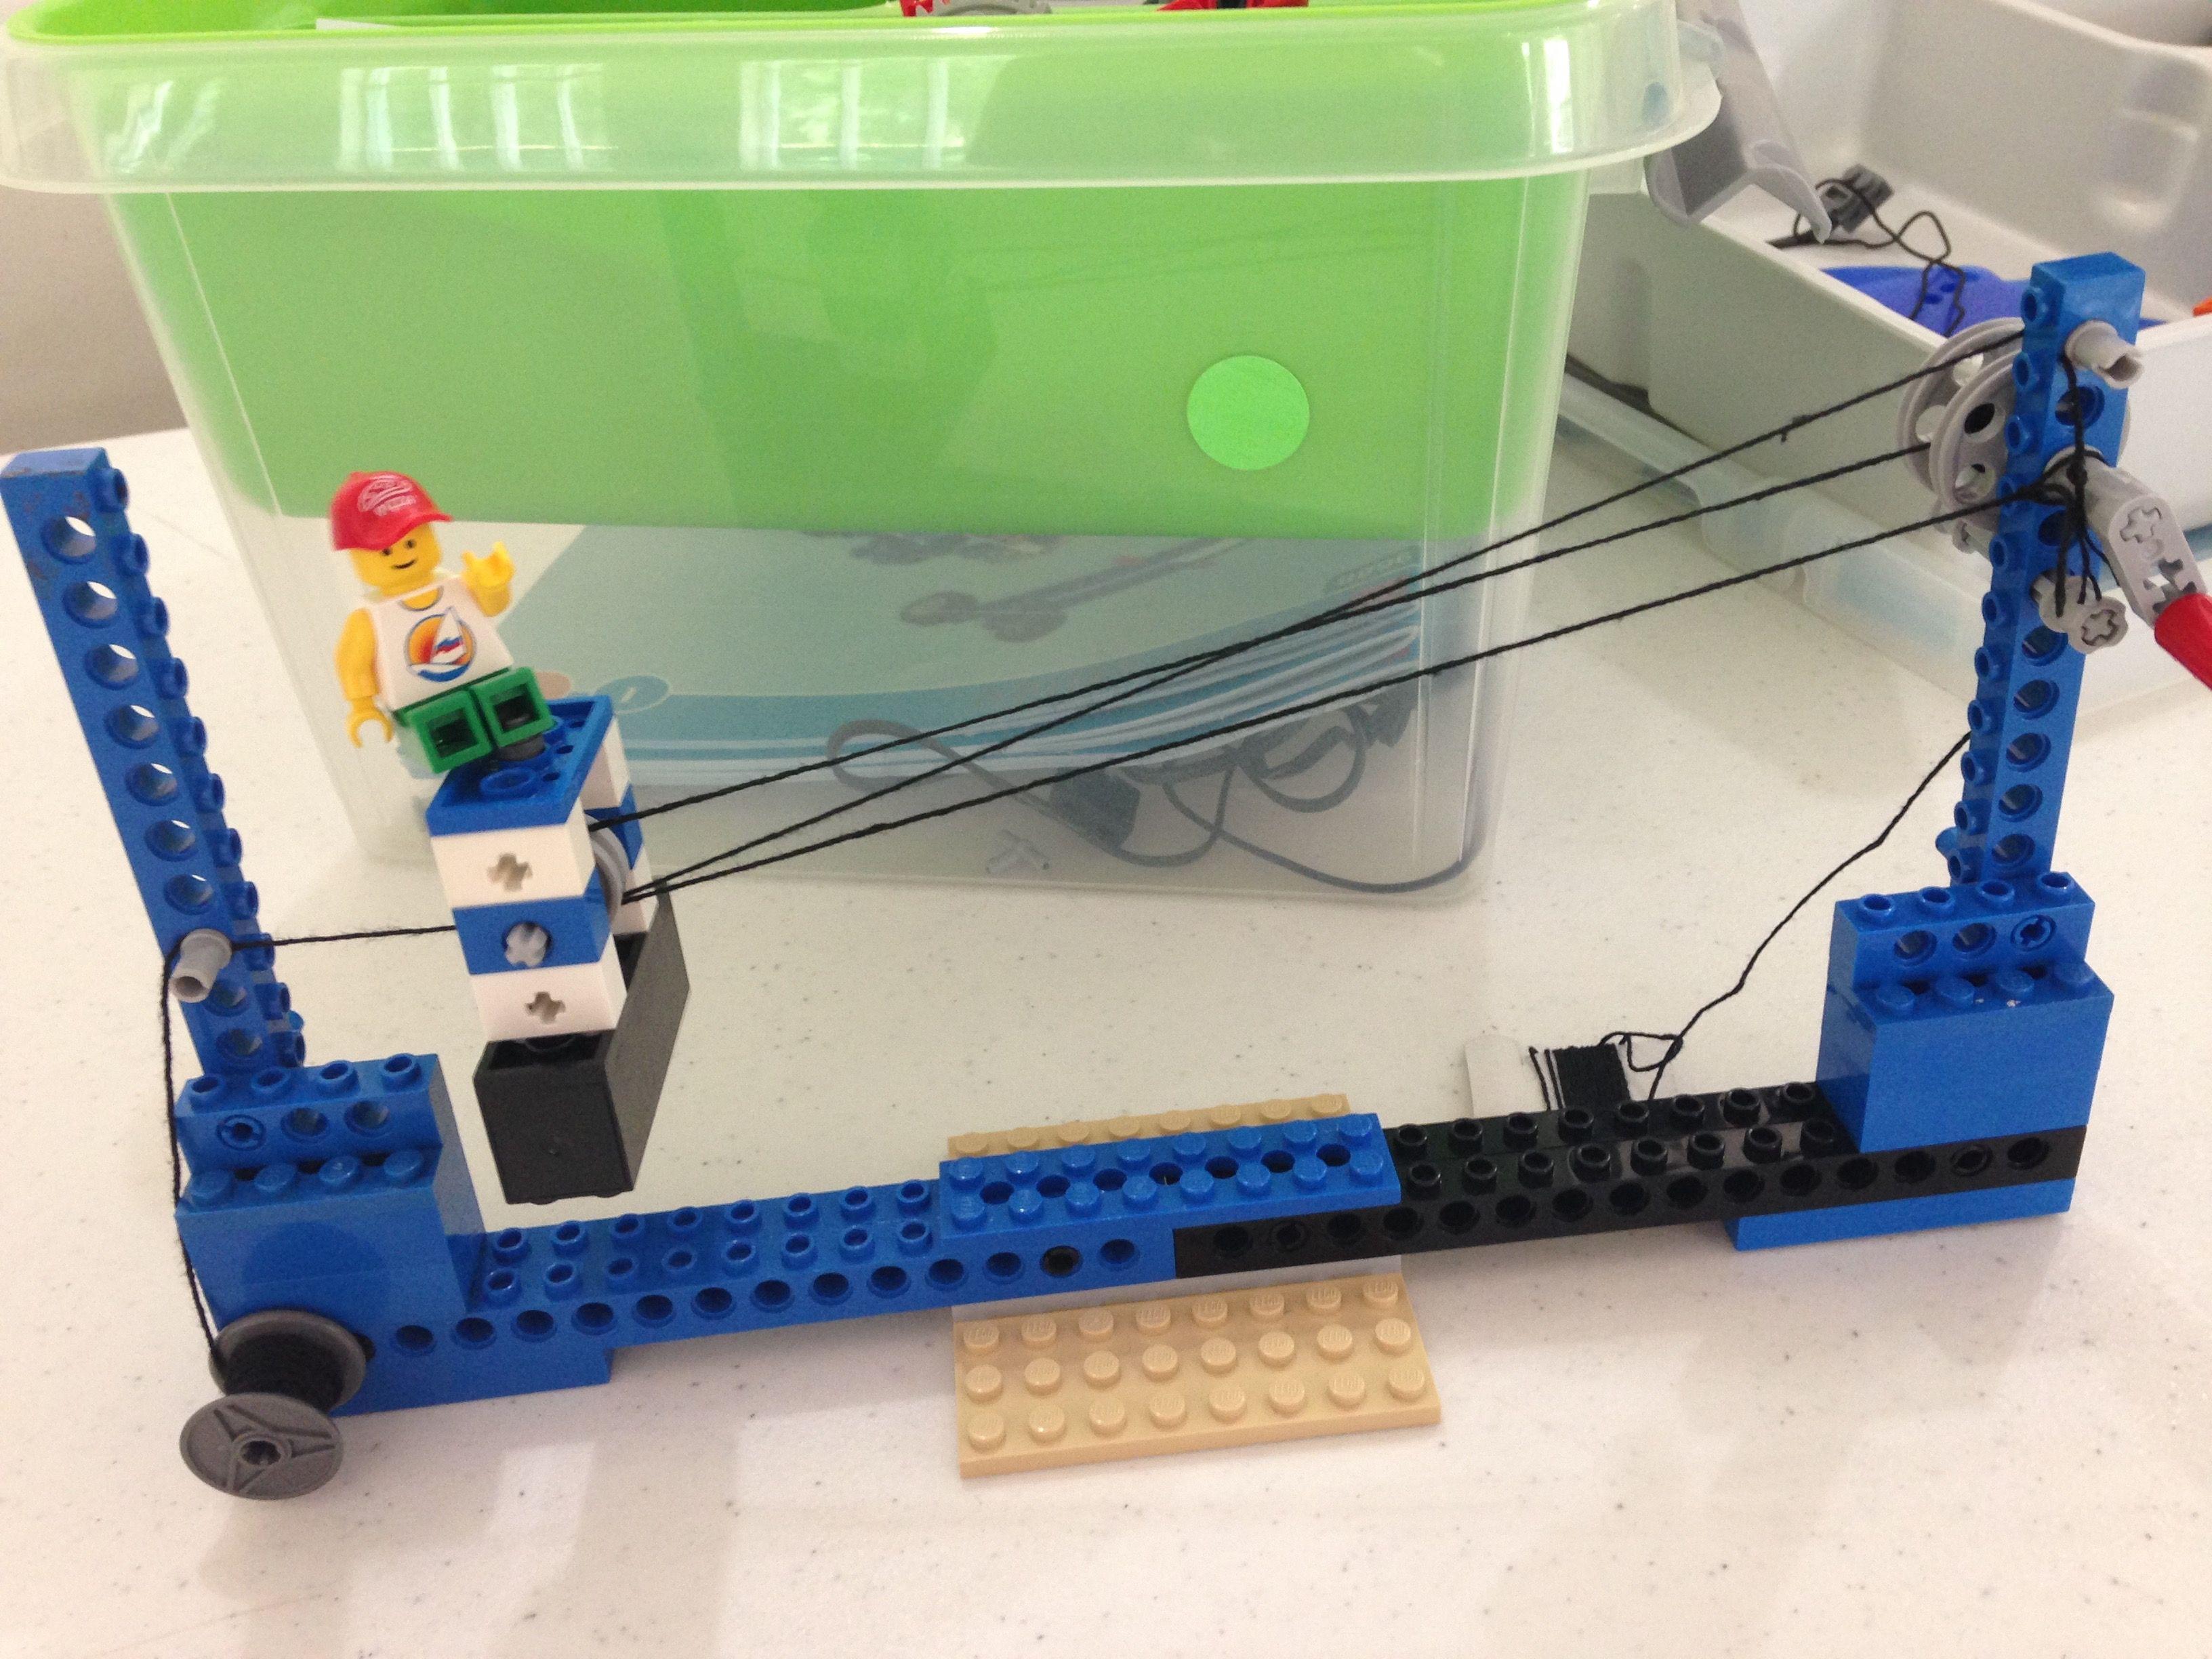 LEGO pulley system created by WoodlandsRobotics.com